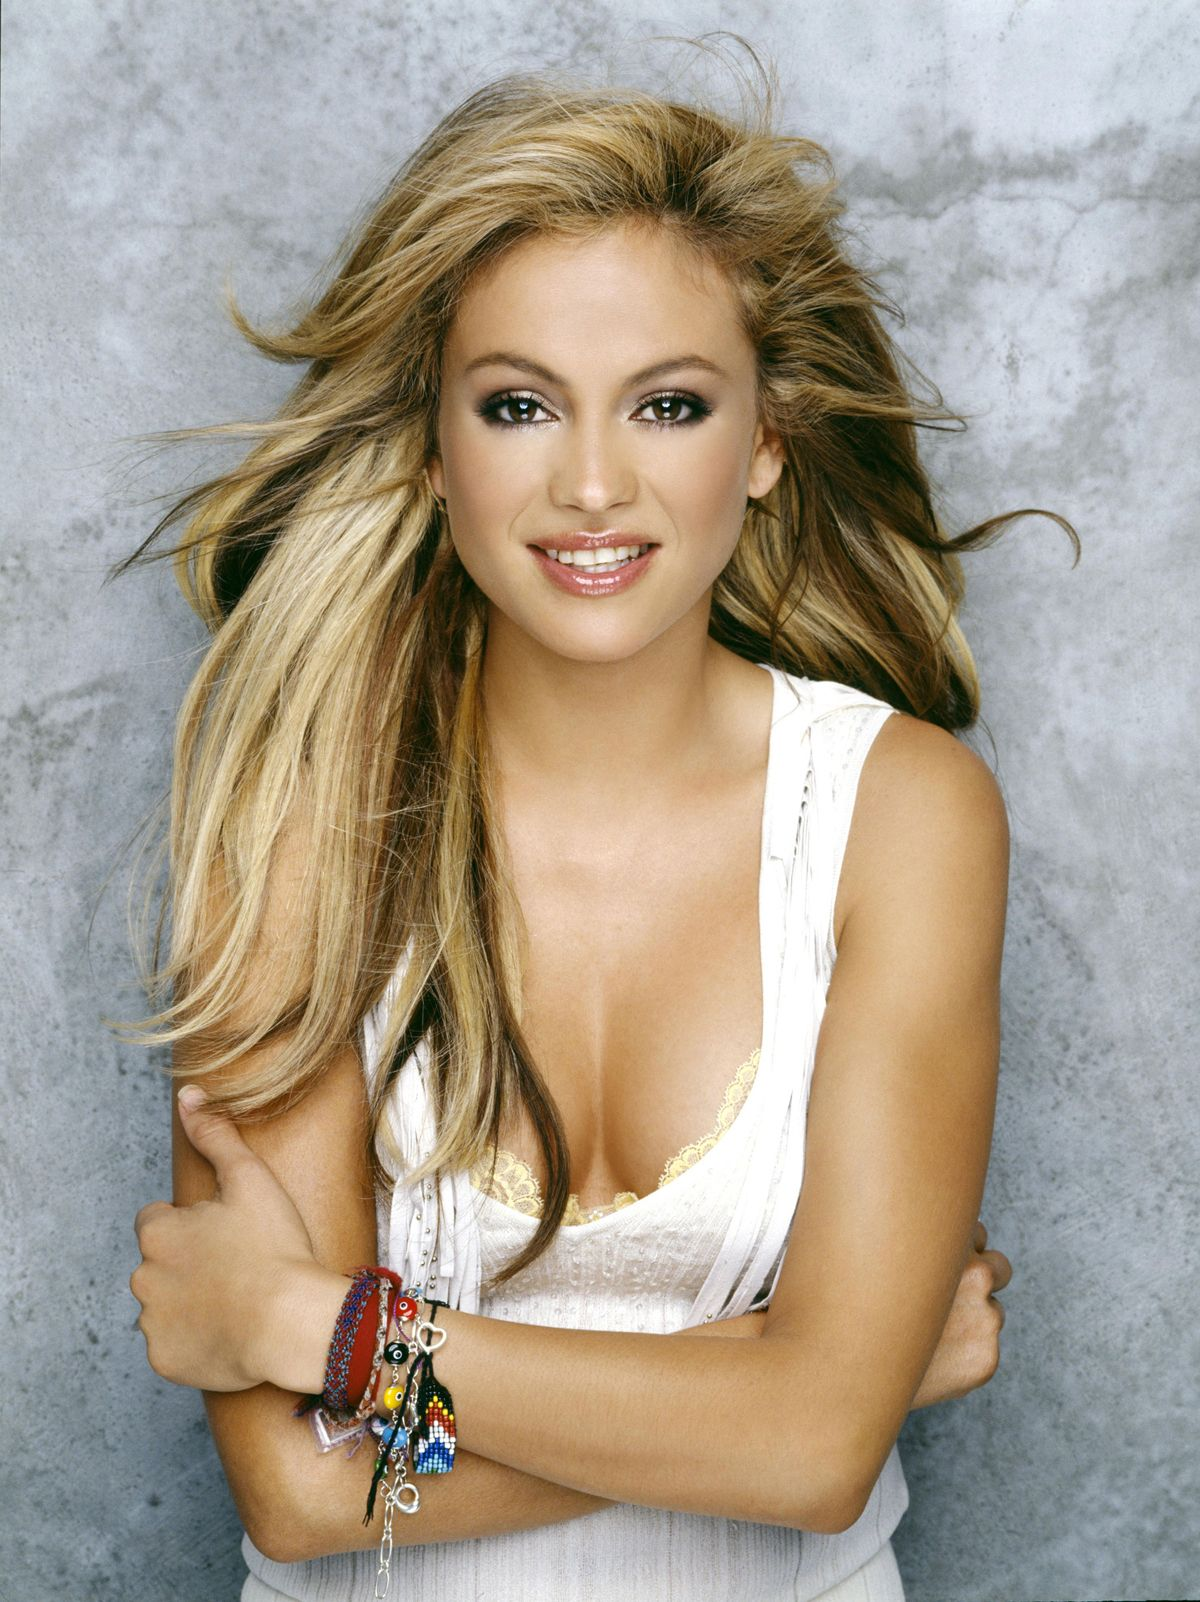 Paulina Rubio Is Myfavorite Artsist She Is A Great Singer My